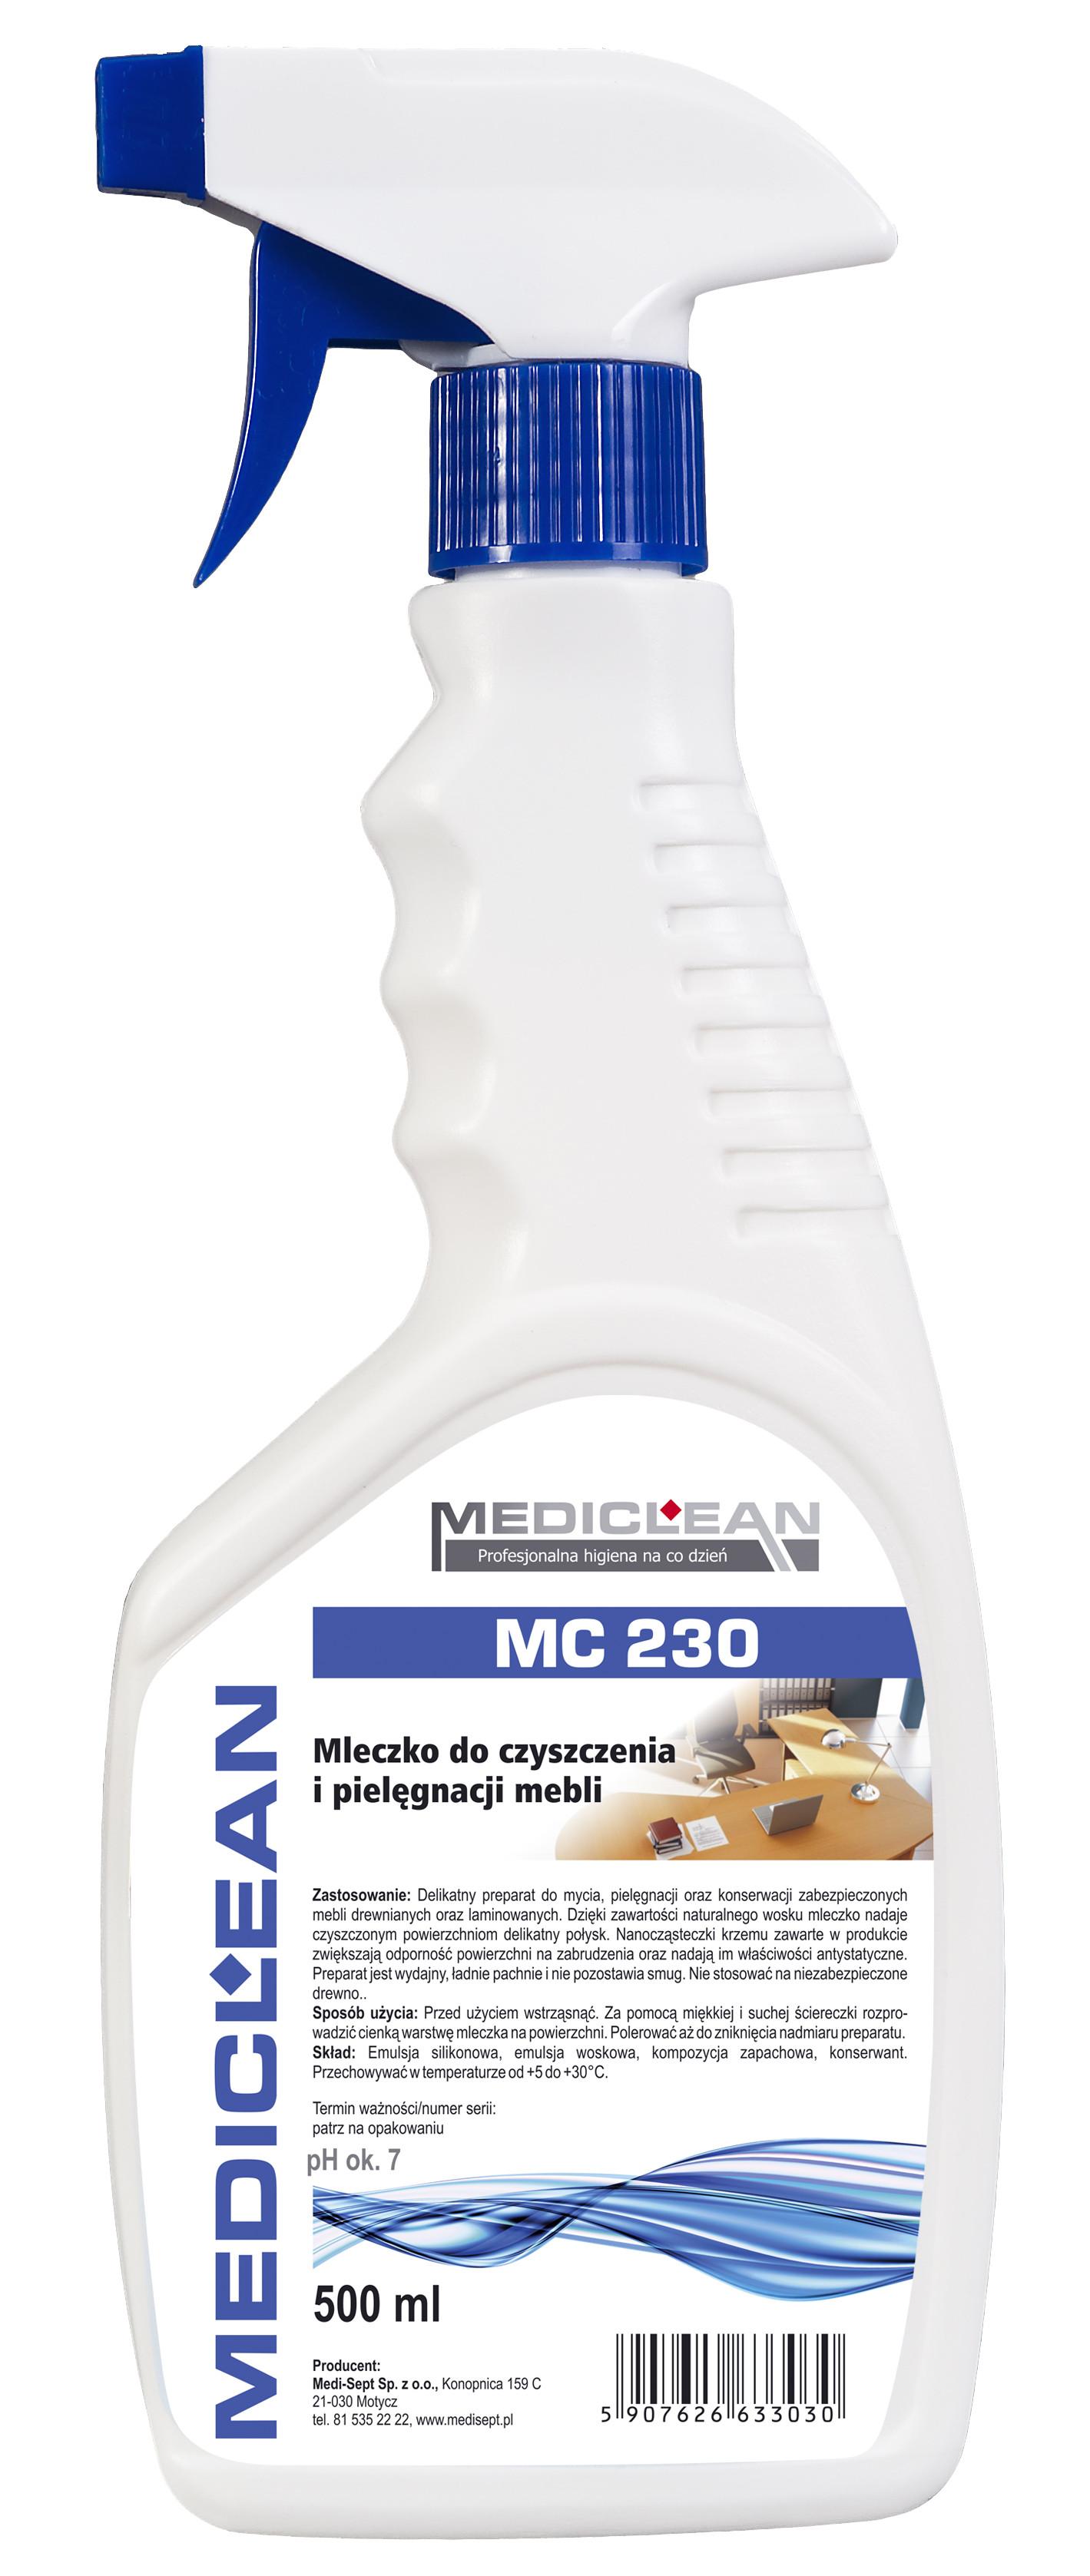 MC 230